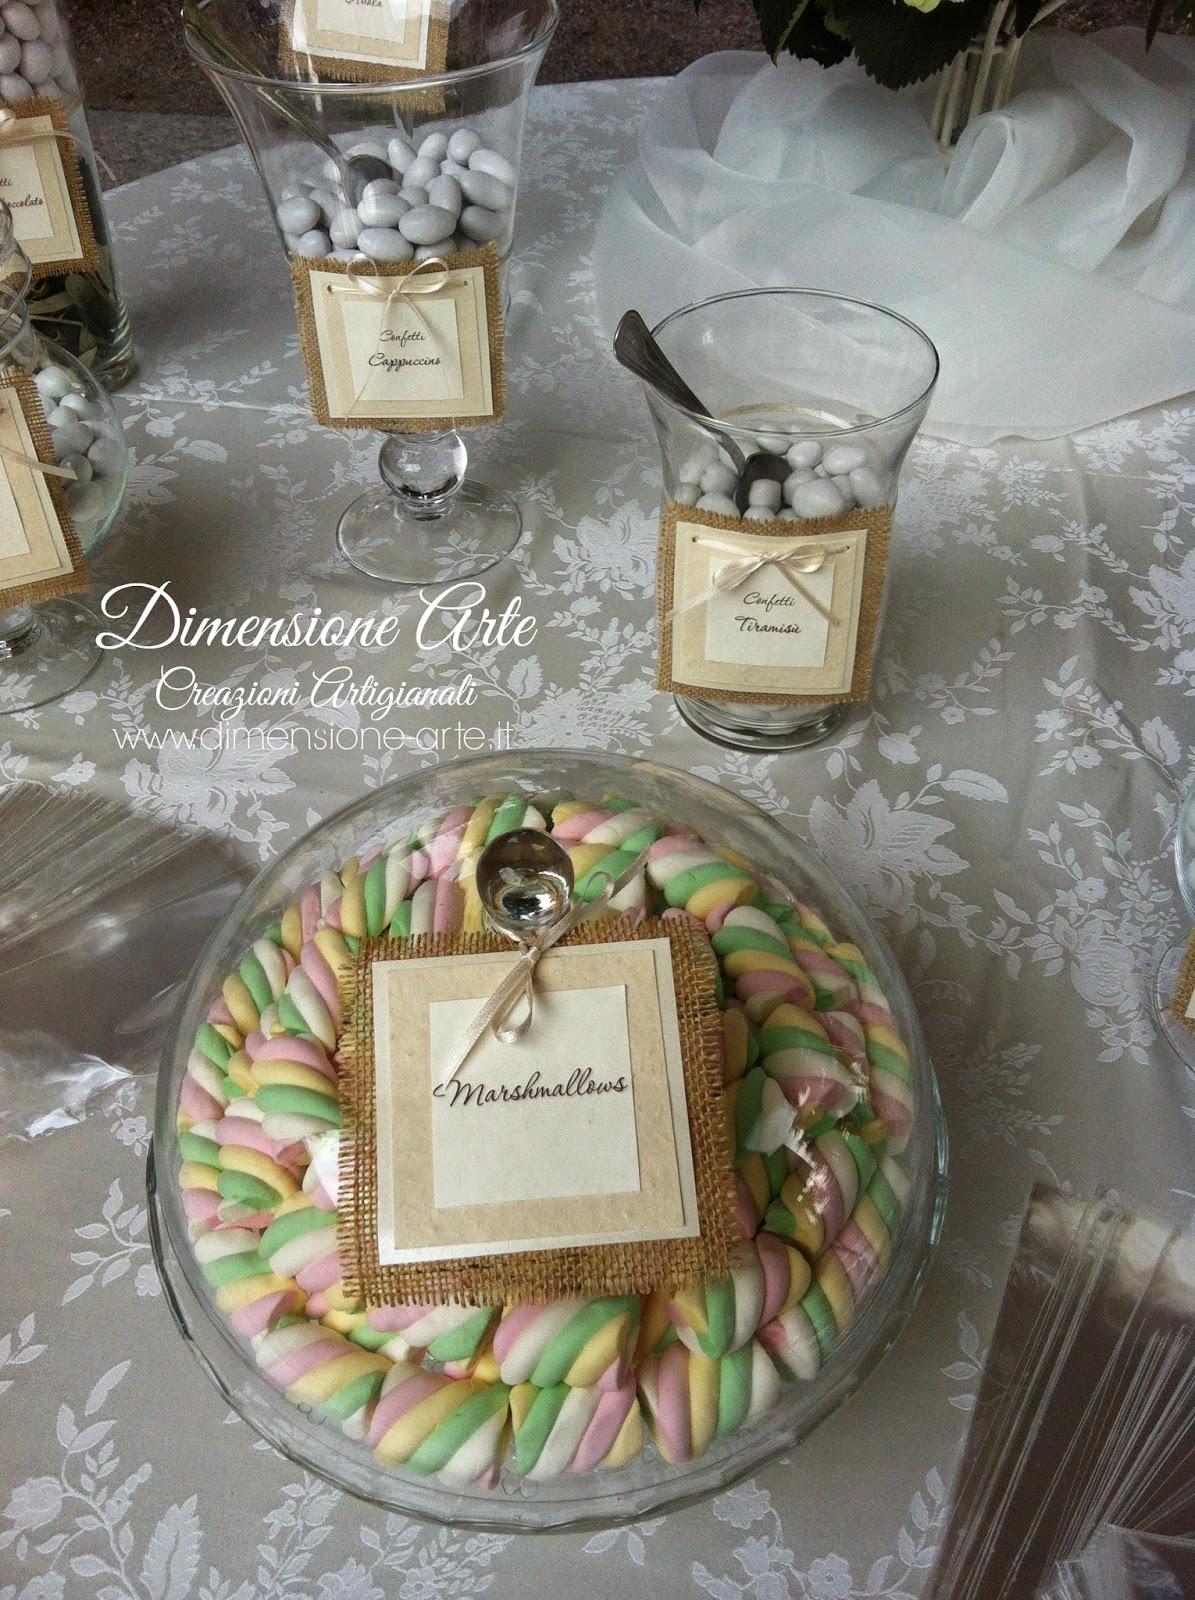 Matrimonio Rustico Elegante : Dimensione arte creazioni artigianali matrimonio